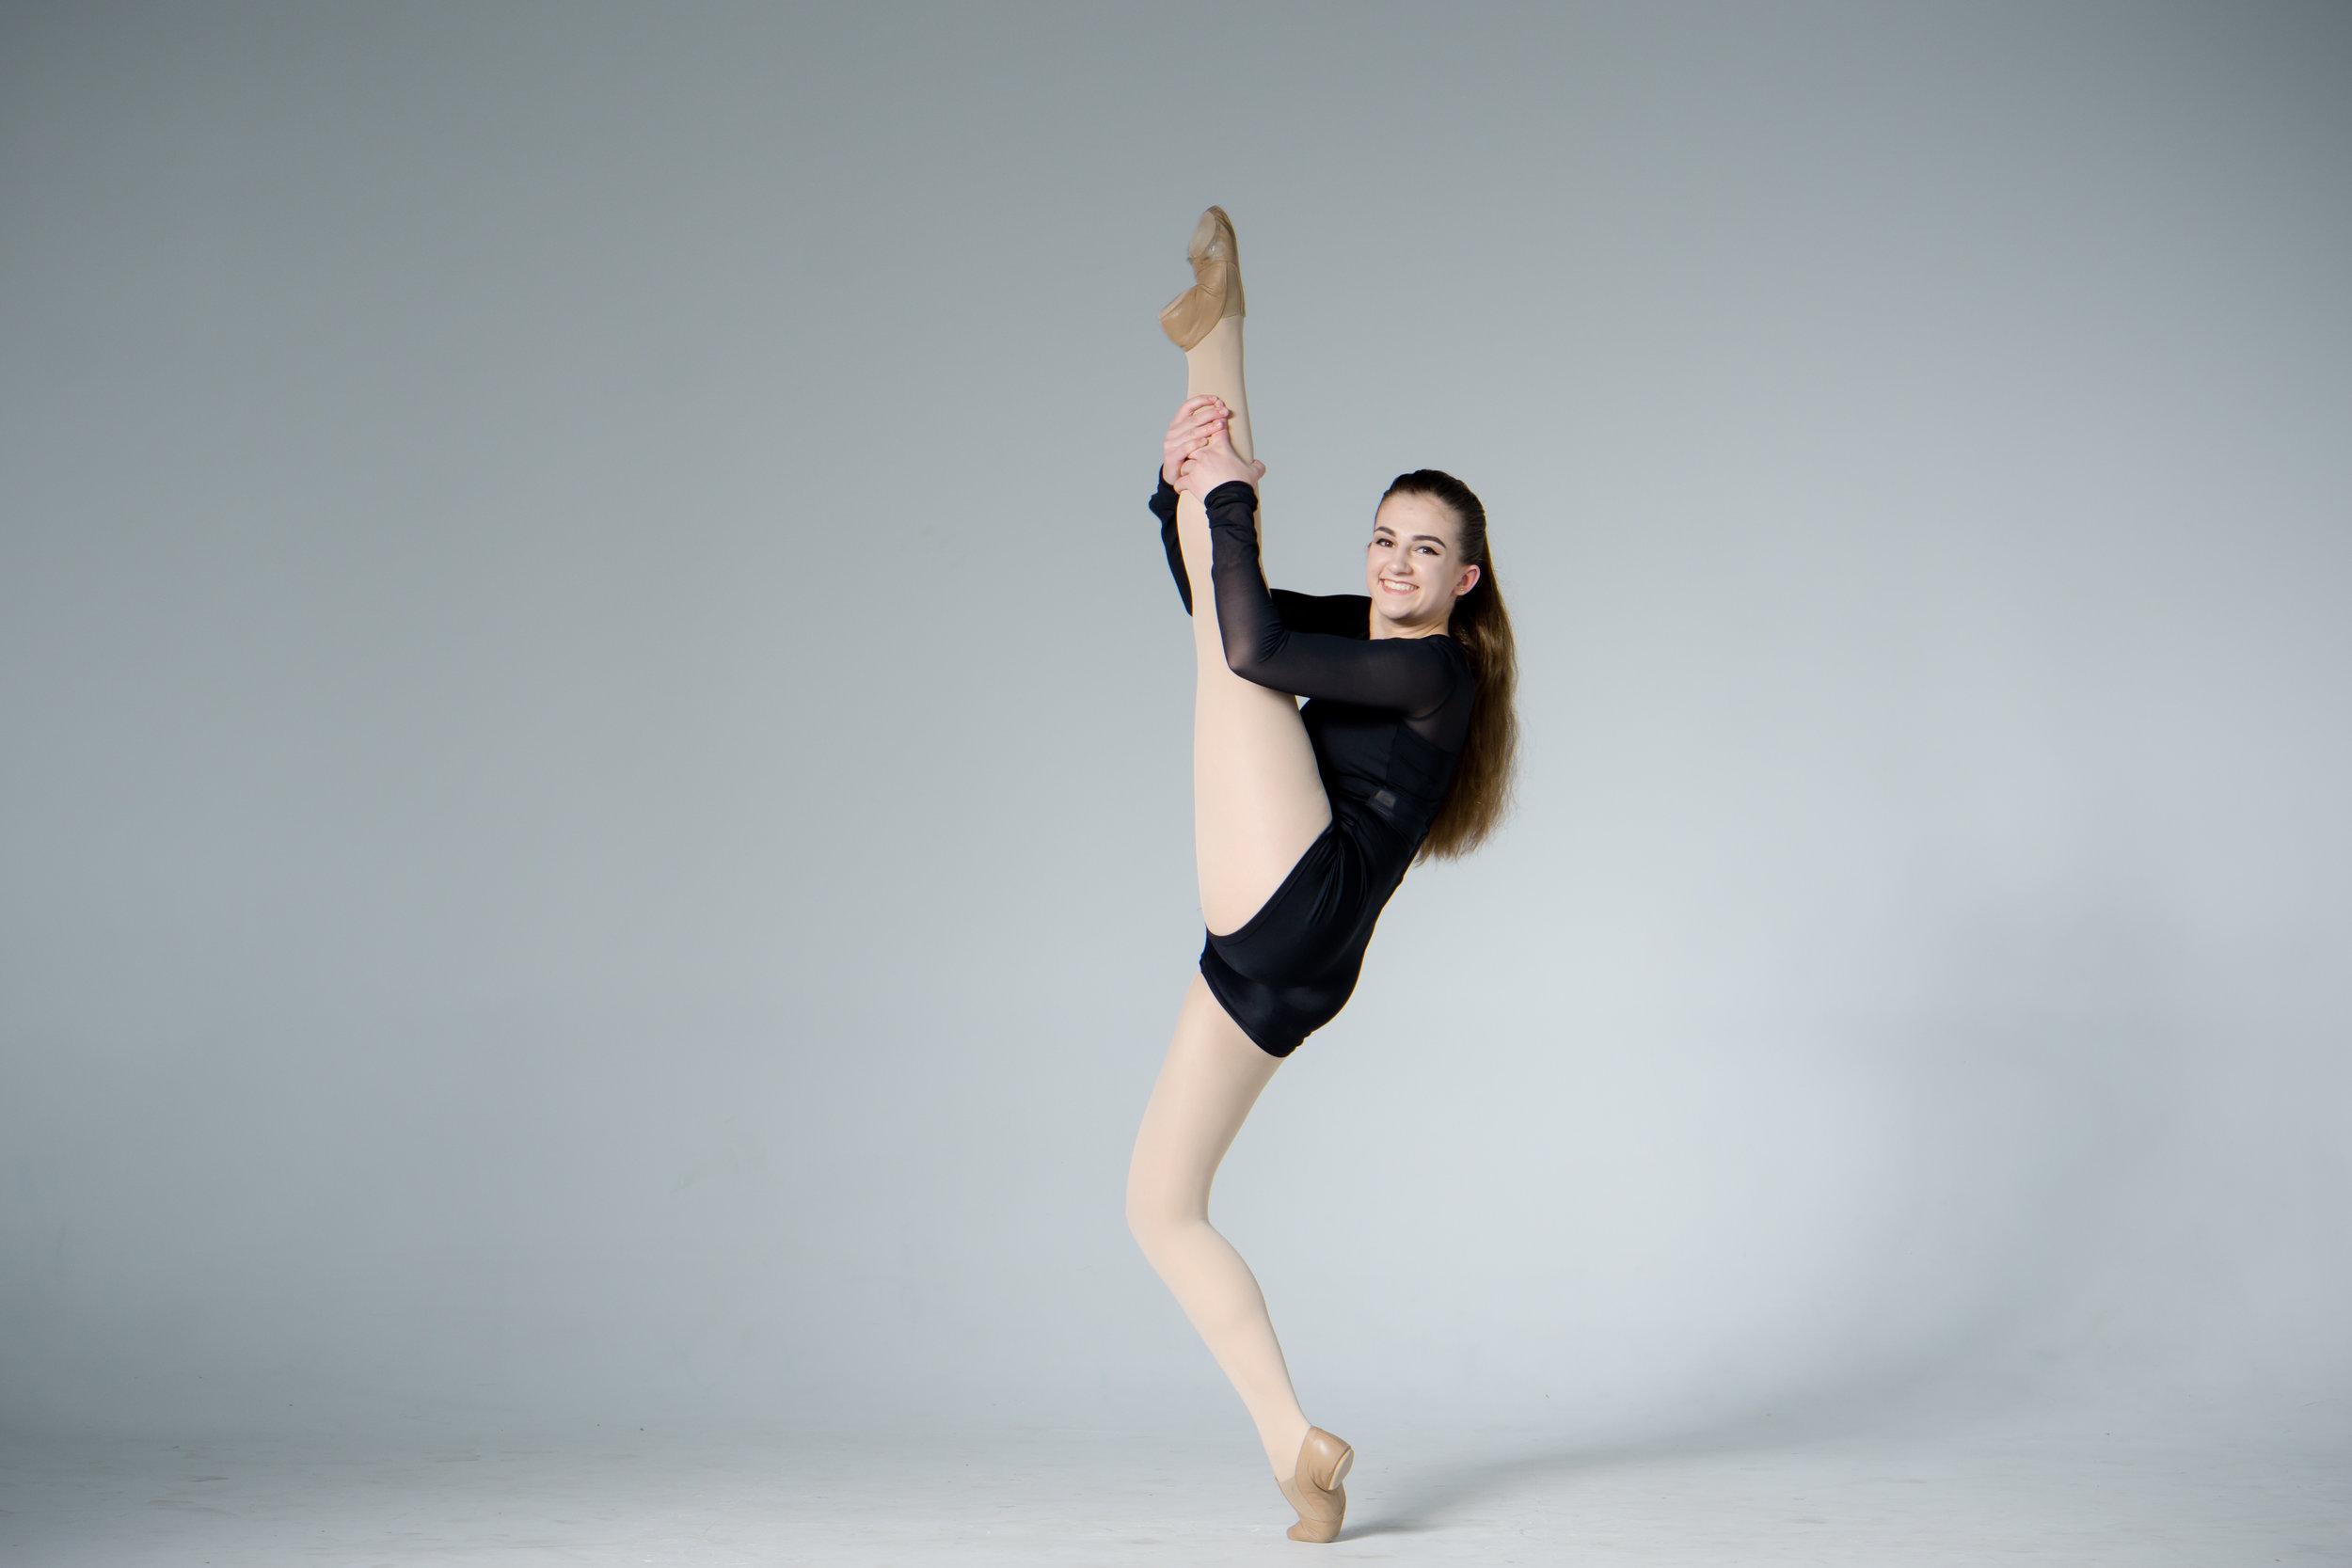 flexible jazz dancer with high leg kick